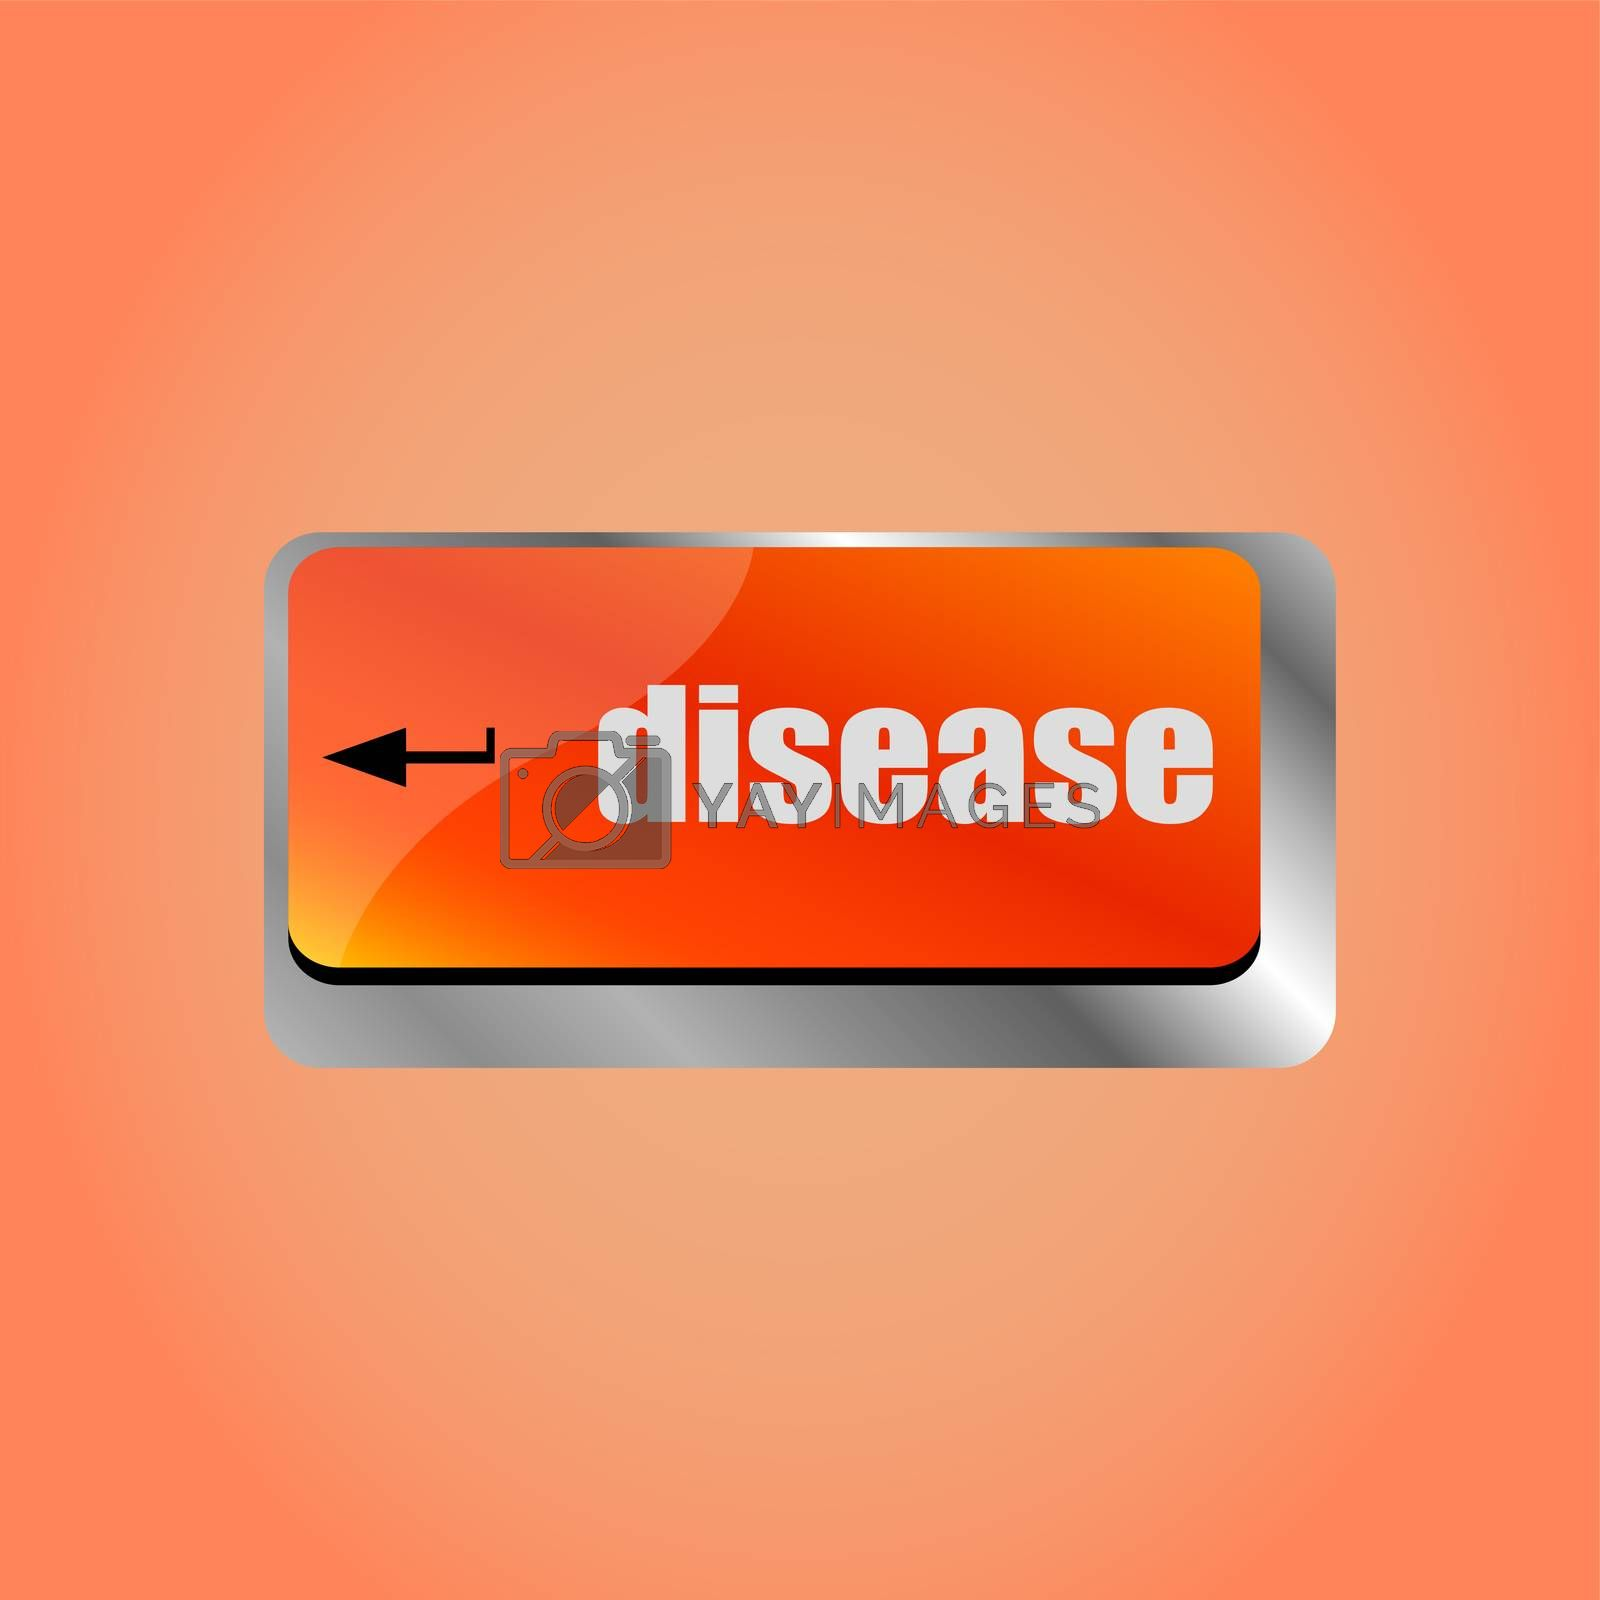 A computer keyboard with enter disease keys